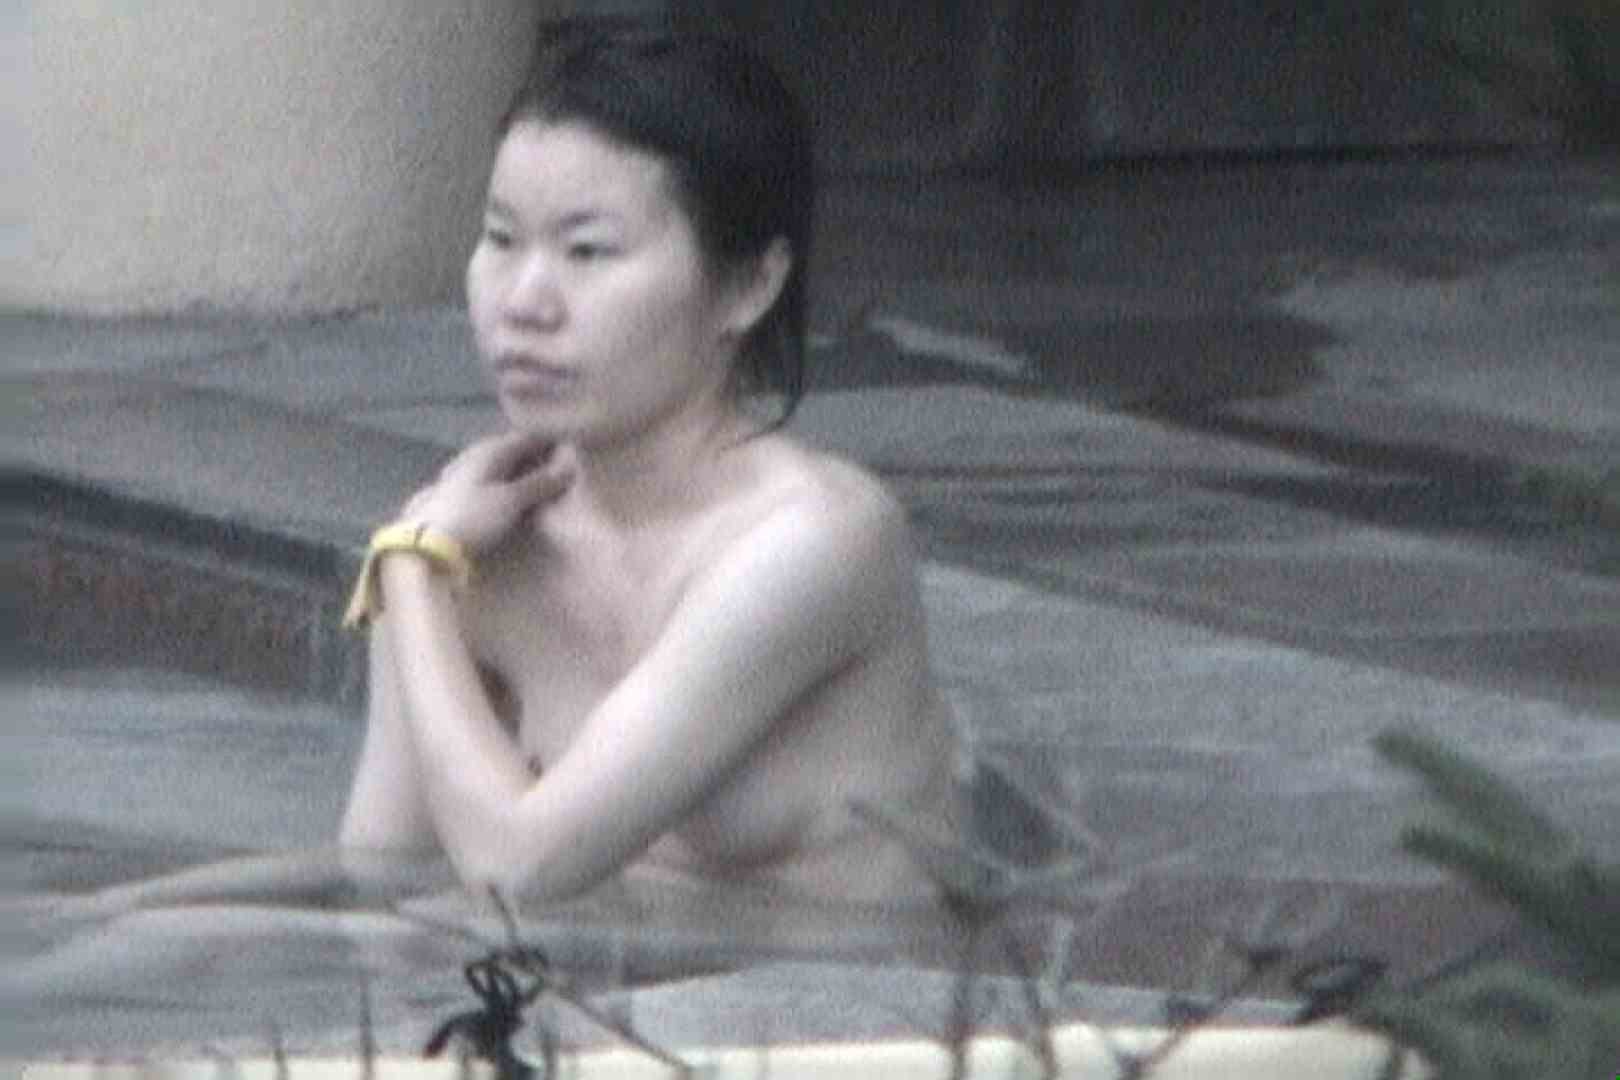 Aquaな露天風呂Vol.556 露天風呂編  99PIX 52